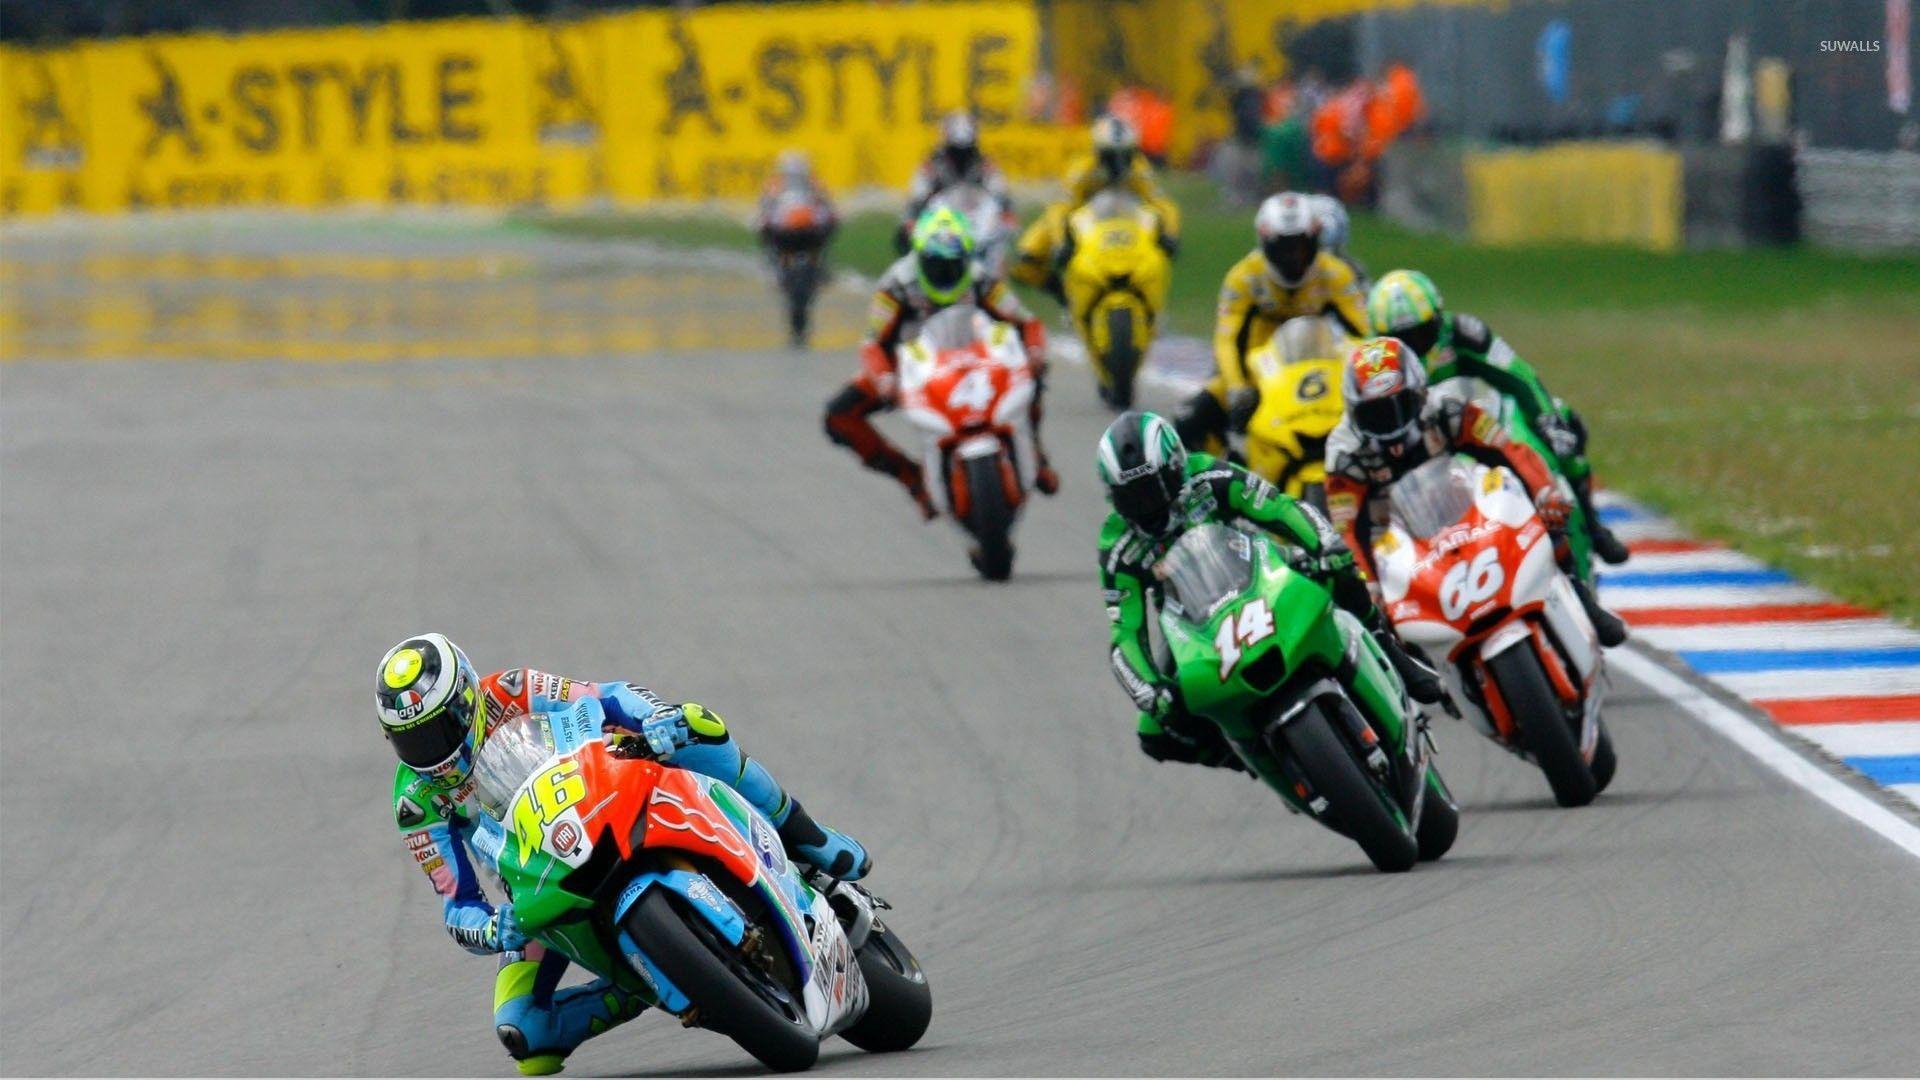 Motorcycle Racing On The Sand Suzuki Hd Desktop Mobile: Racing Bike Wallpapers